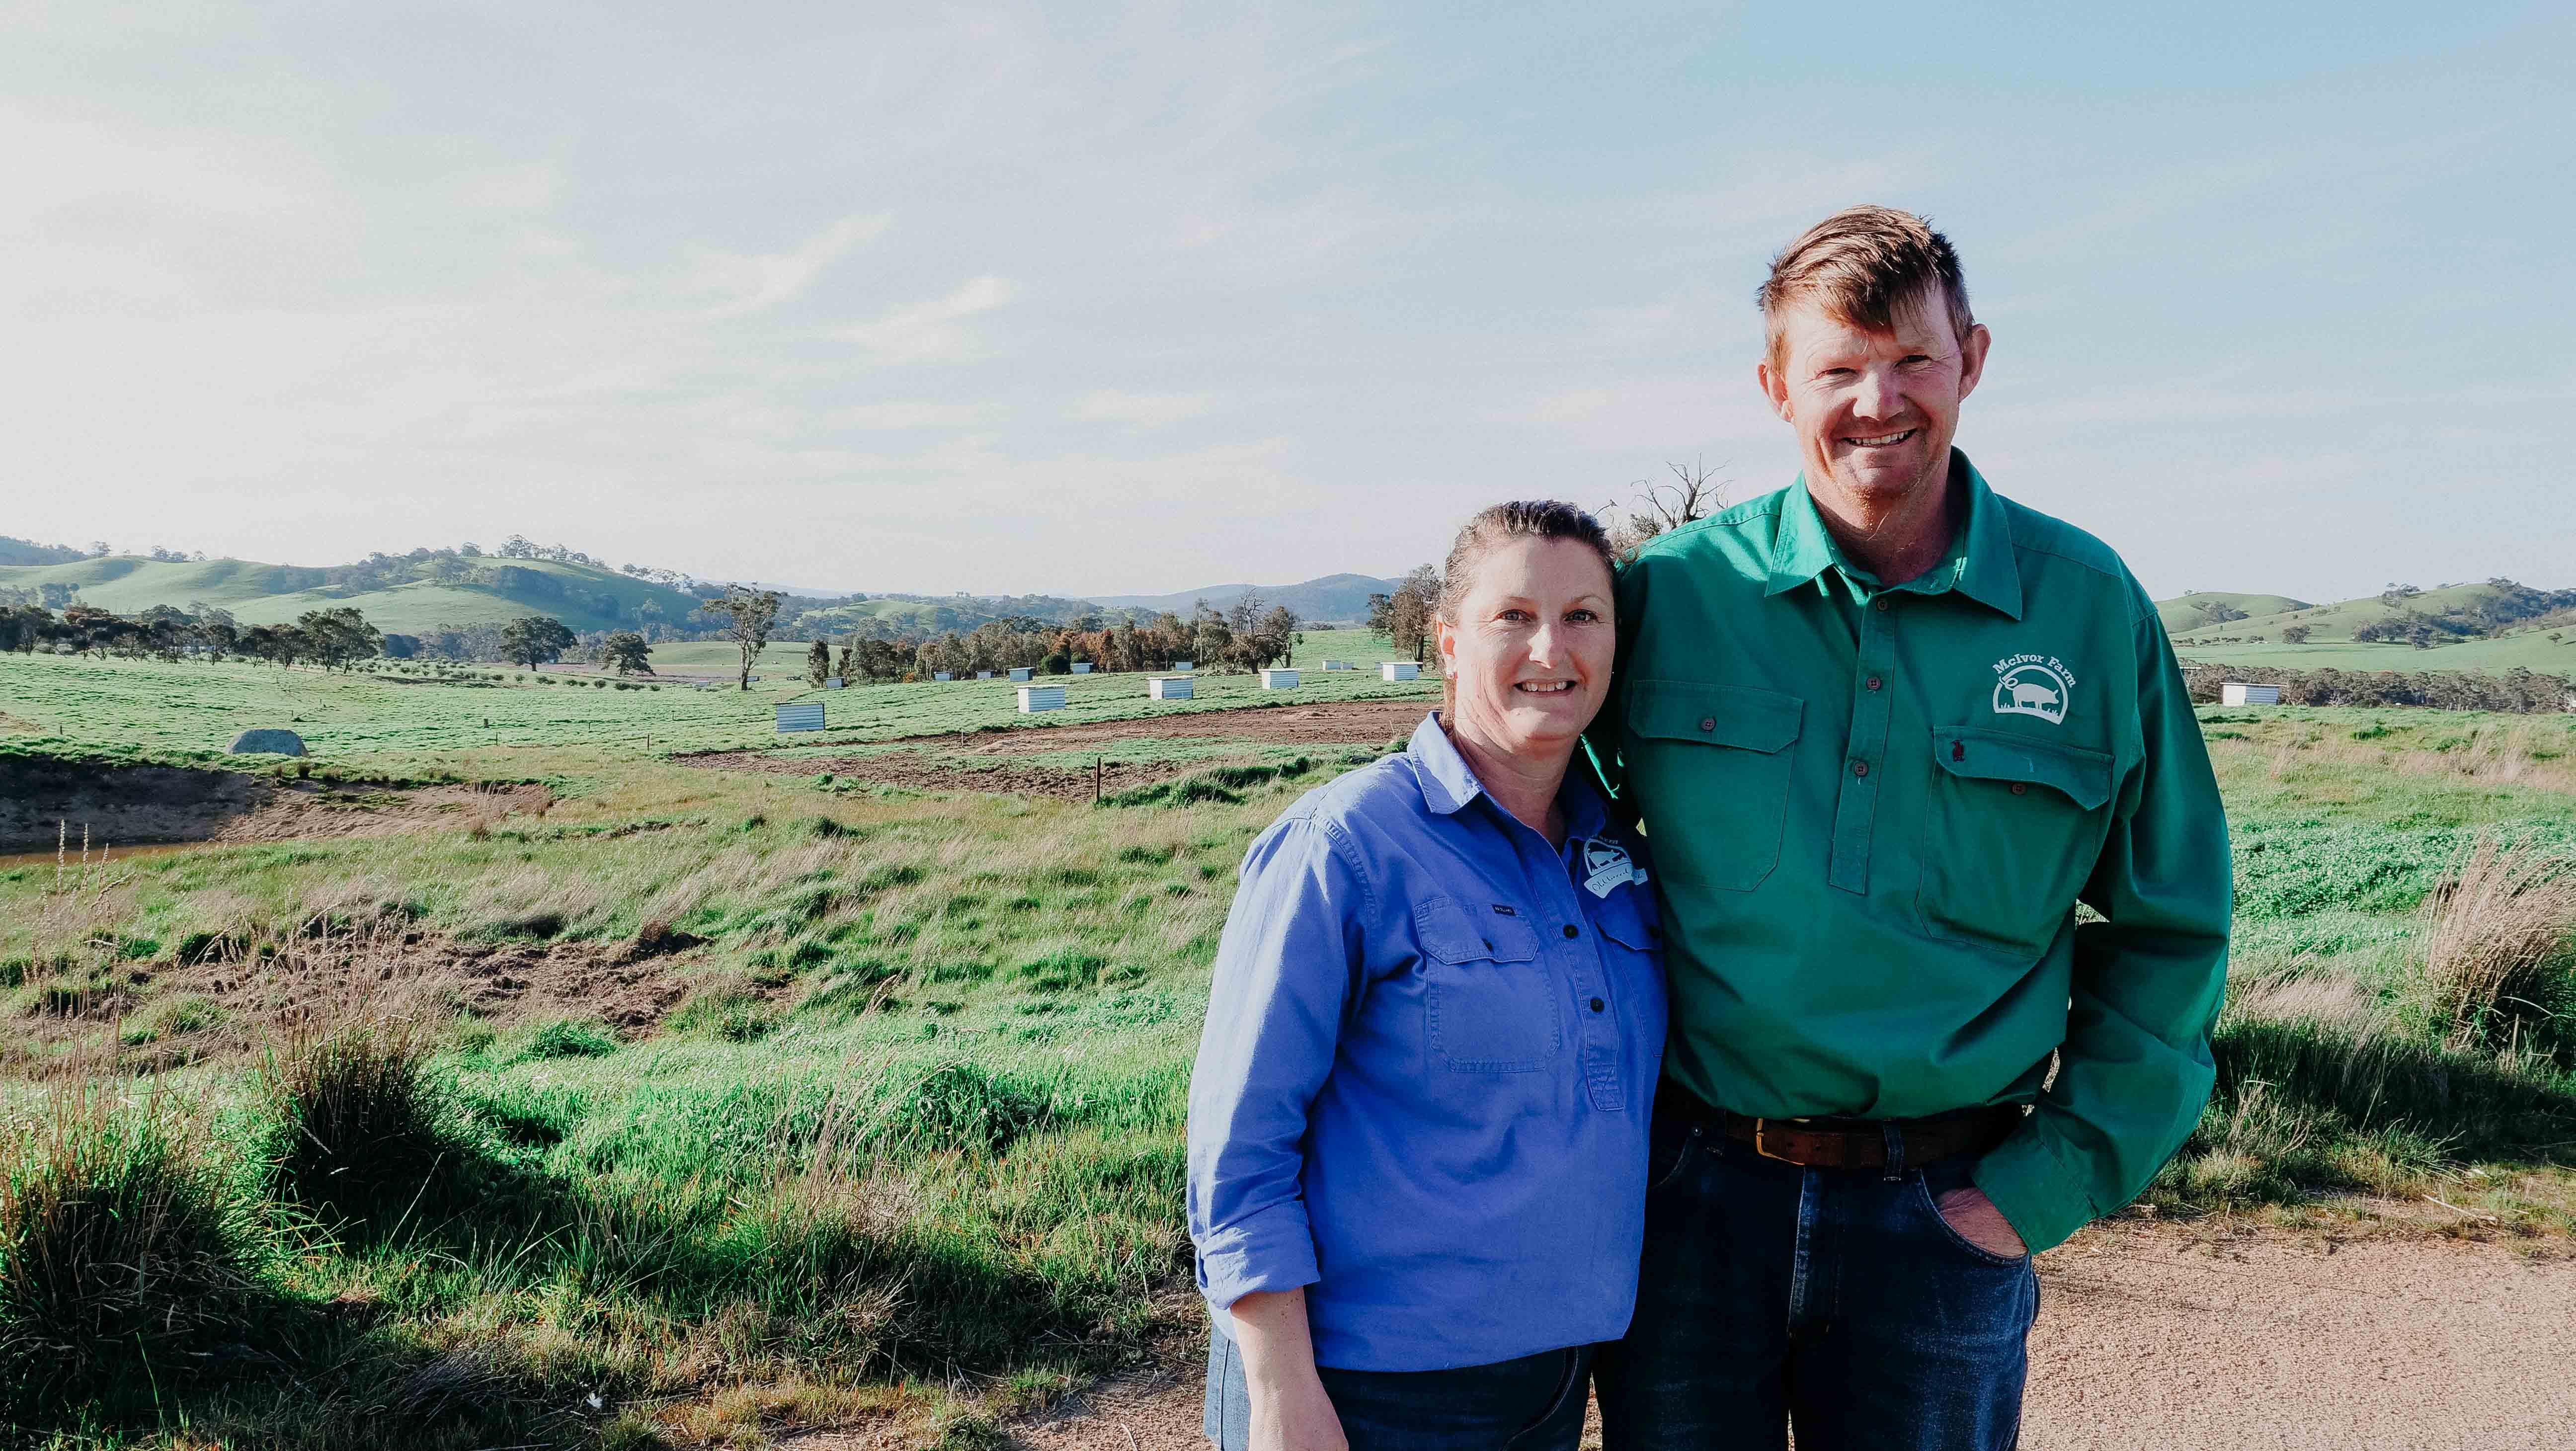 belinda and jason hagan on family farm in tooborac victoria